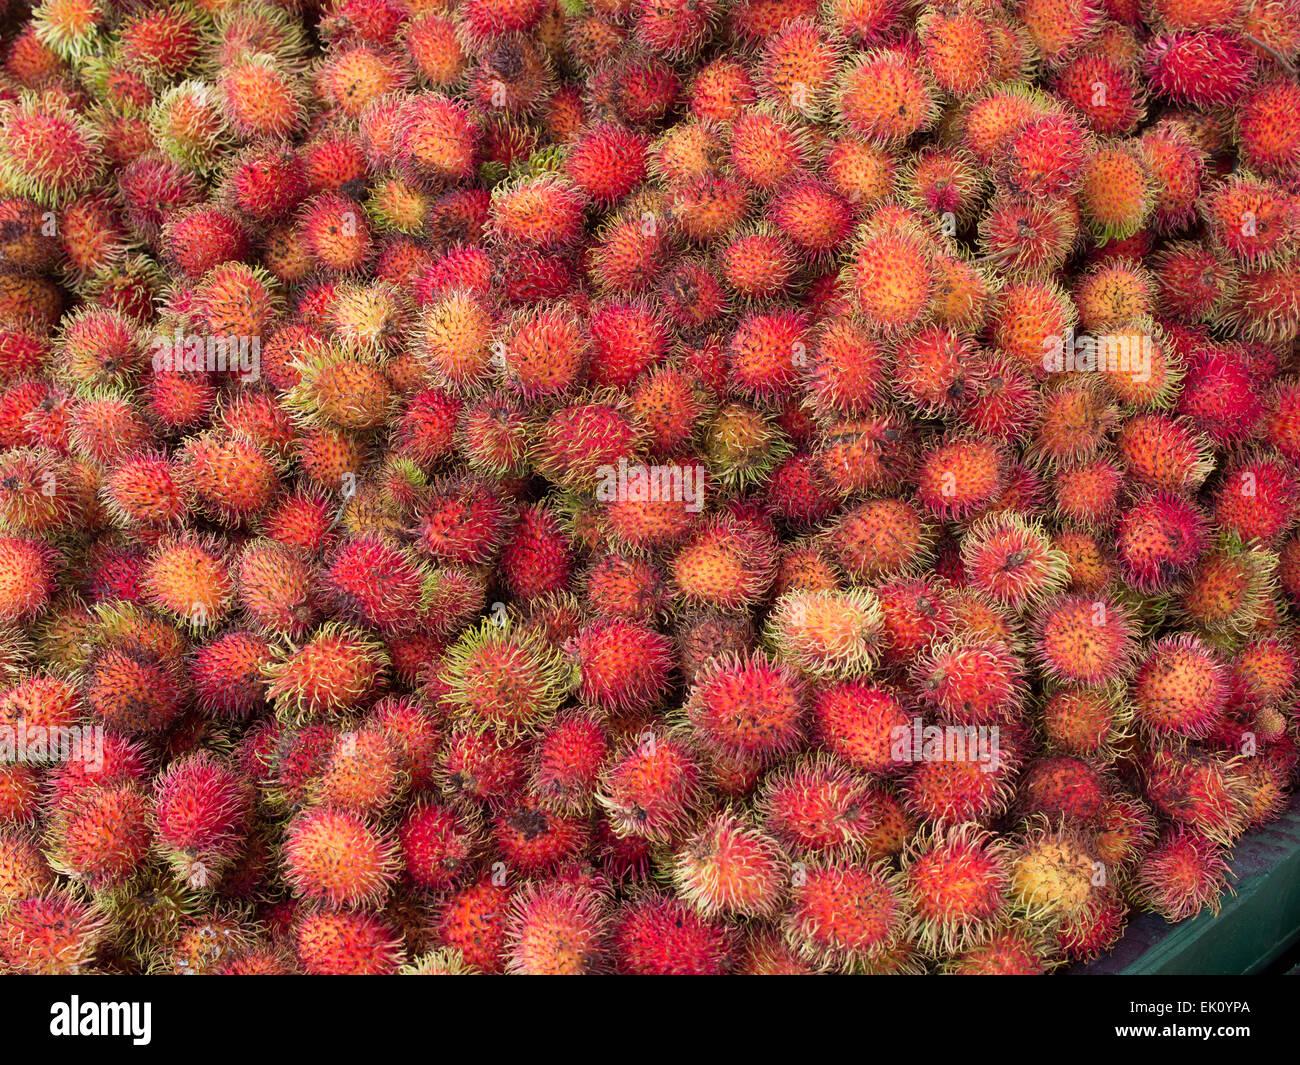 Mamon chino fruit in a Costa Rican market - Stock Image